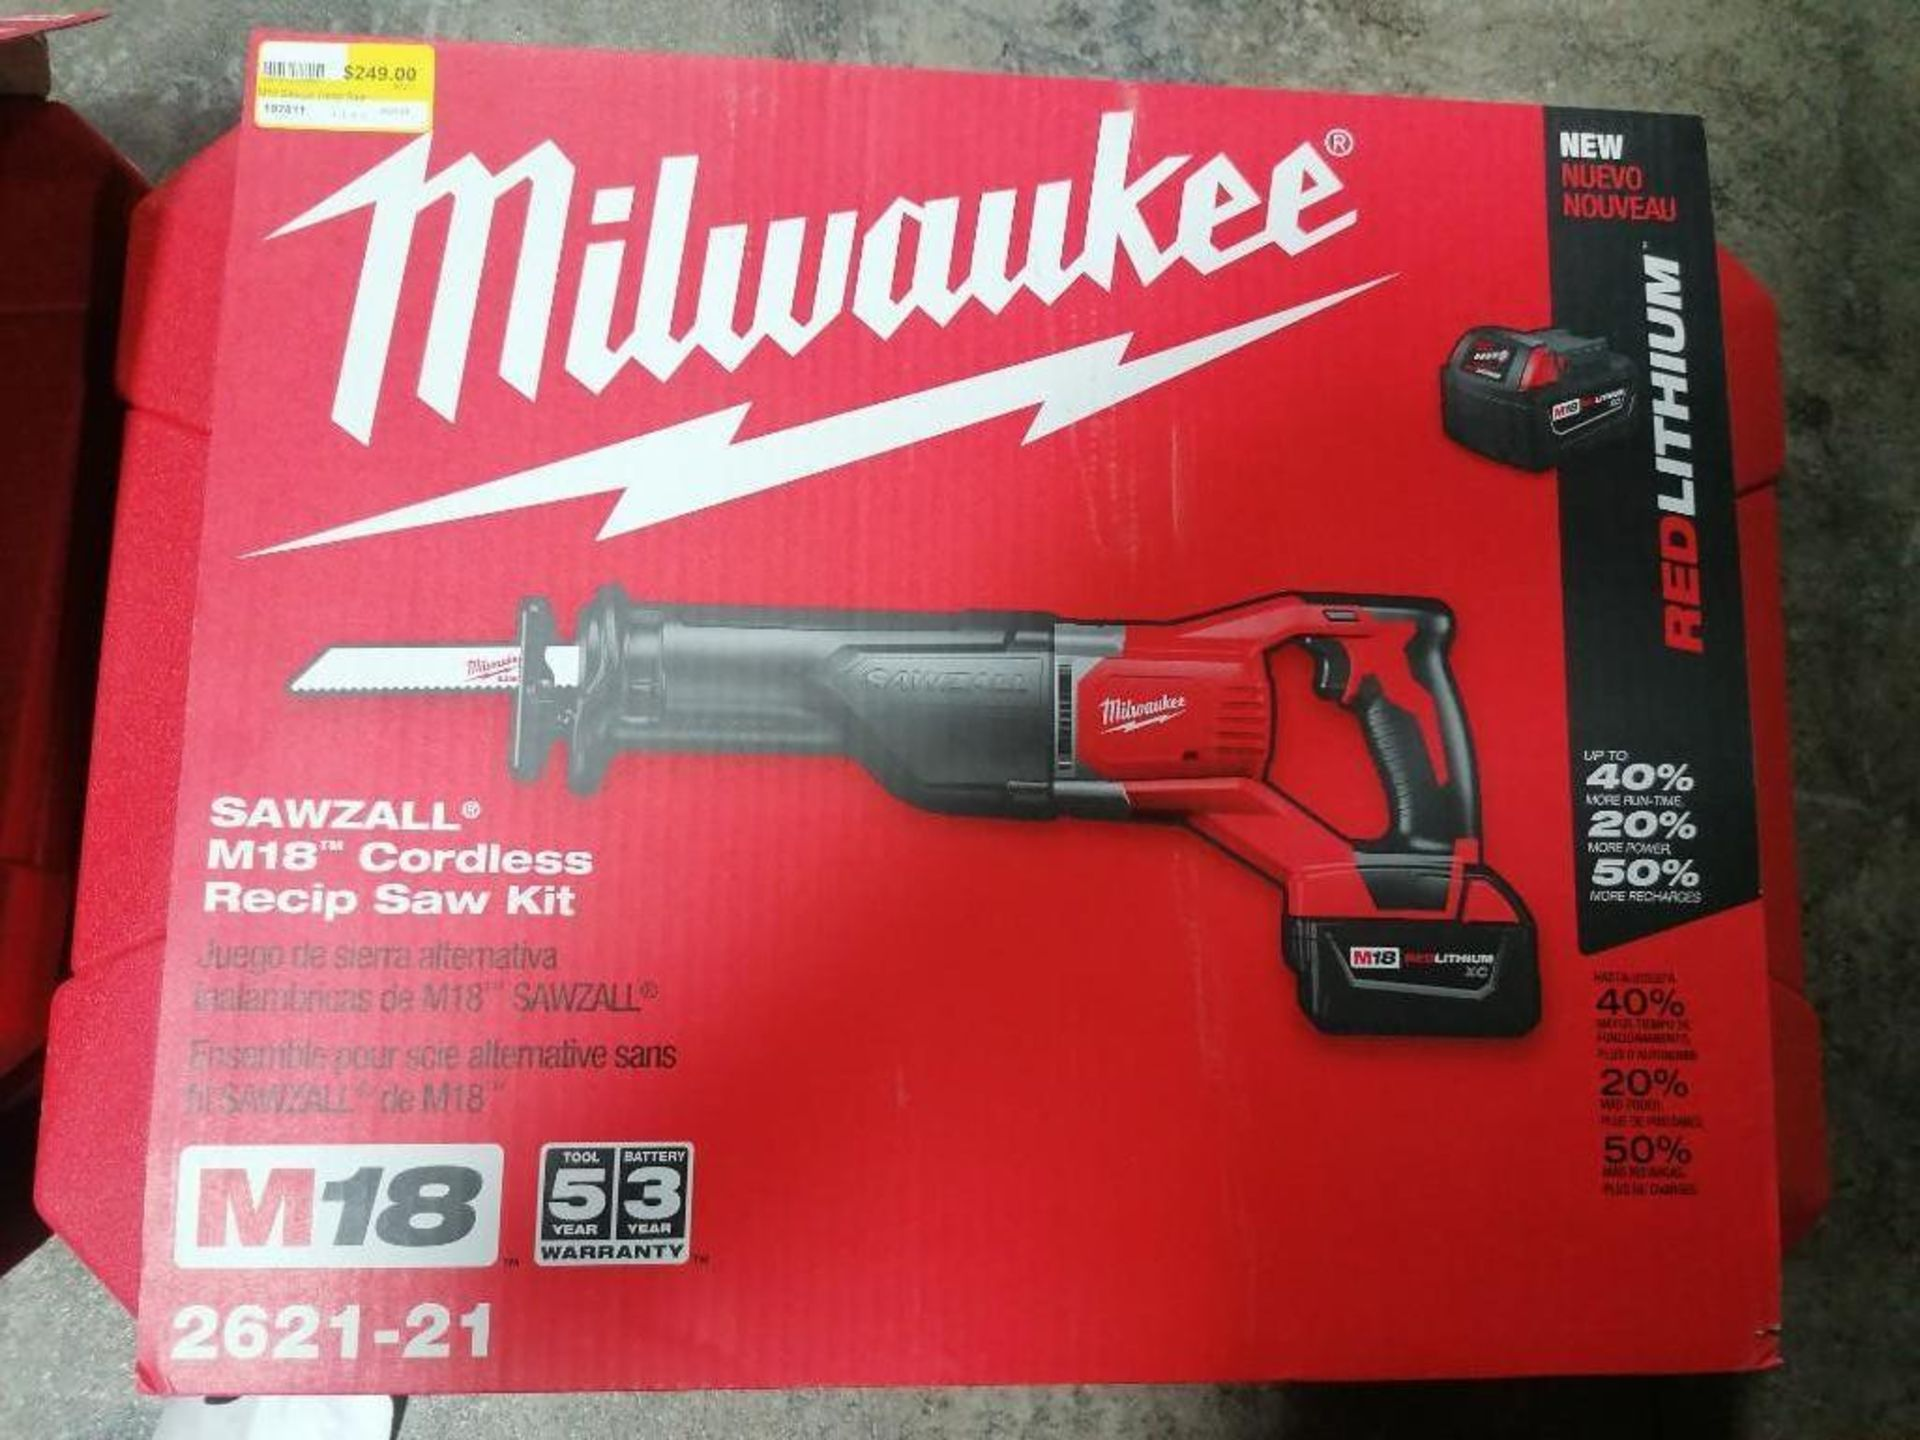 "(1) NEW Milwaukee M18 1/2"" Compact Drill Kit & (1) NEW Milwaukee M18 Cordless Recip Saw Kit. Located - Image 2 of 3"